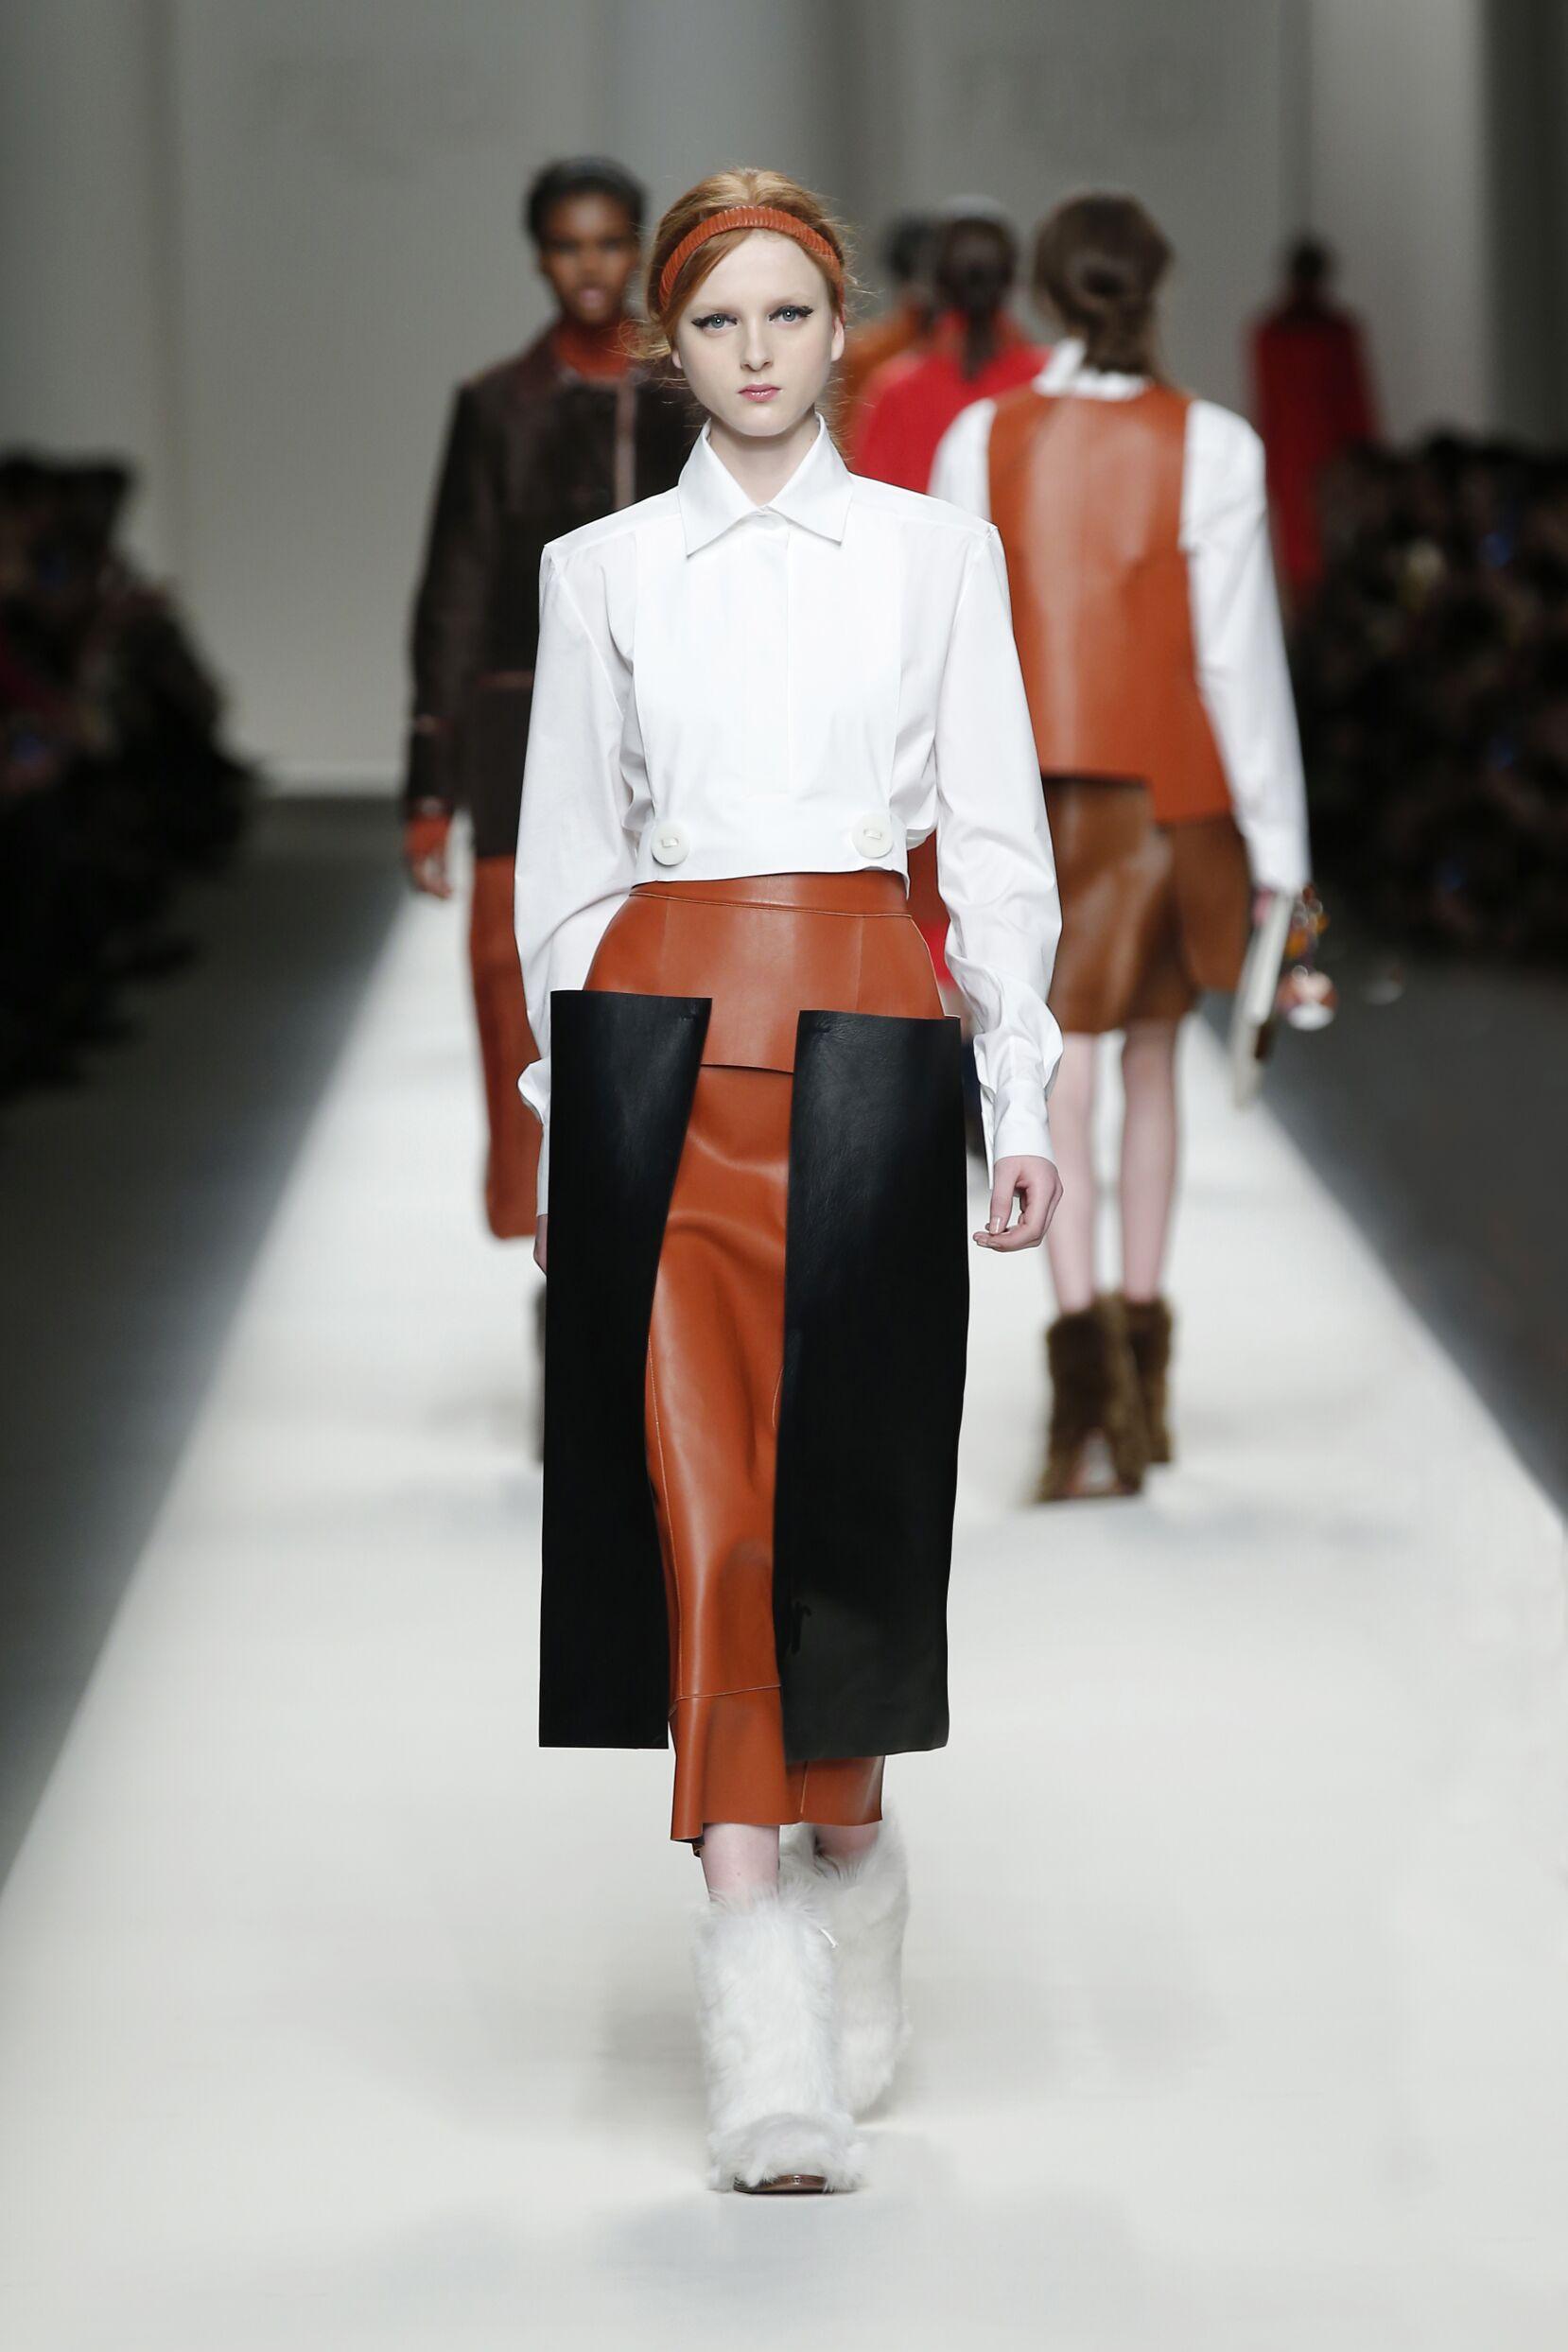 Runway Fendi Fall Winter 2015 16 Women's Collection Milan Fashion Week